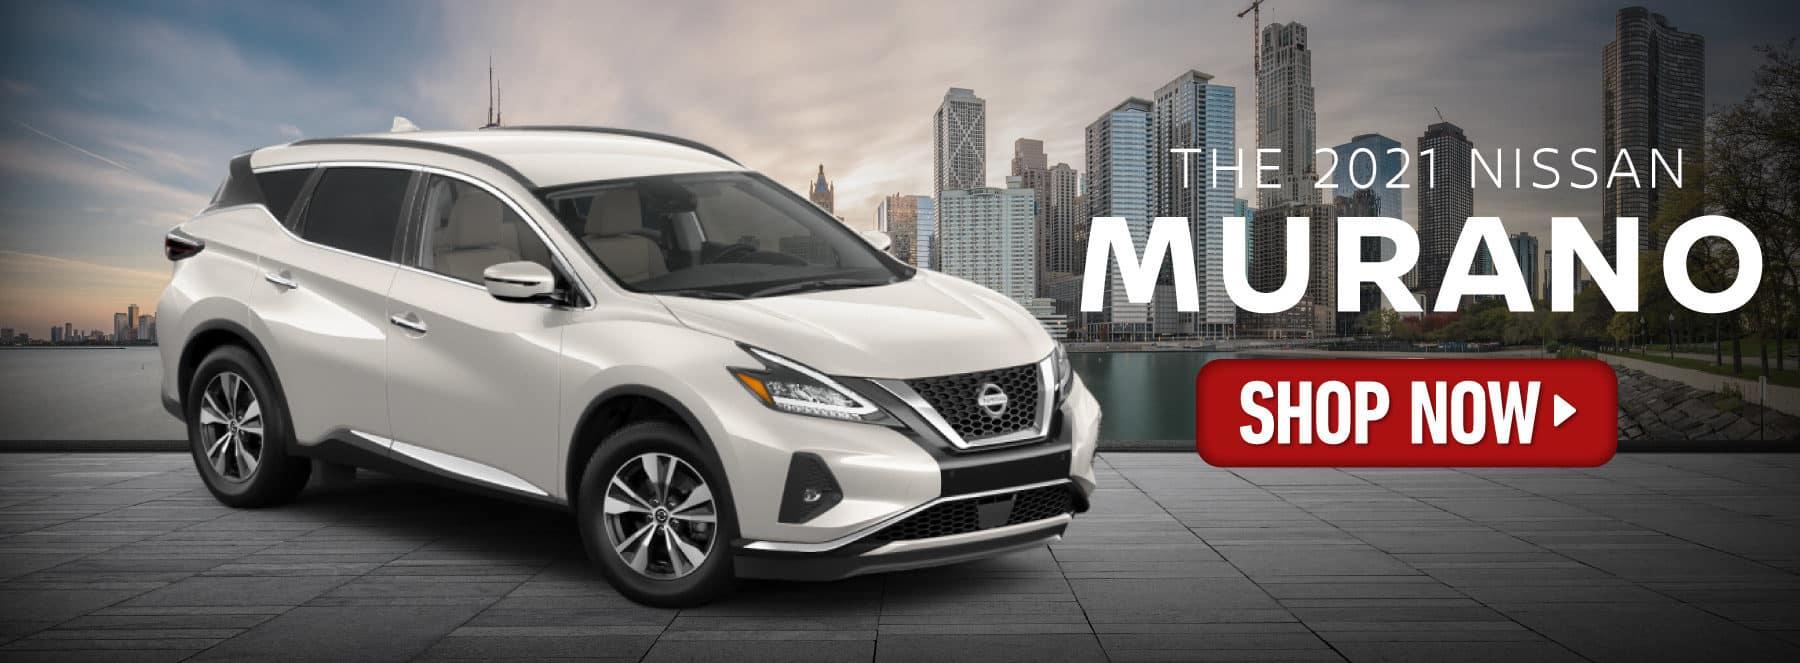 2021 Nissan Murano | Act Now